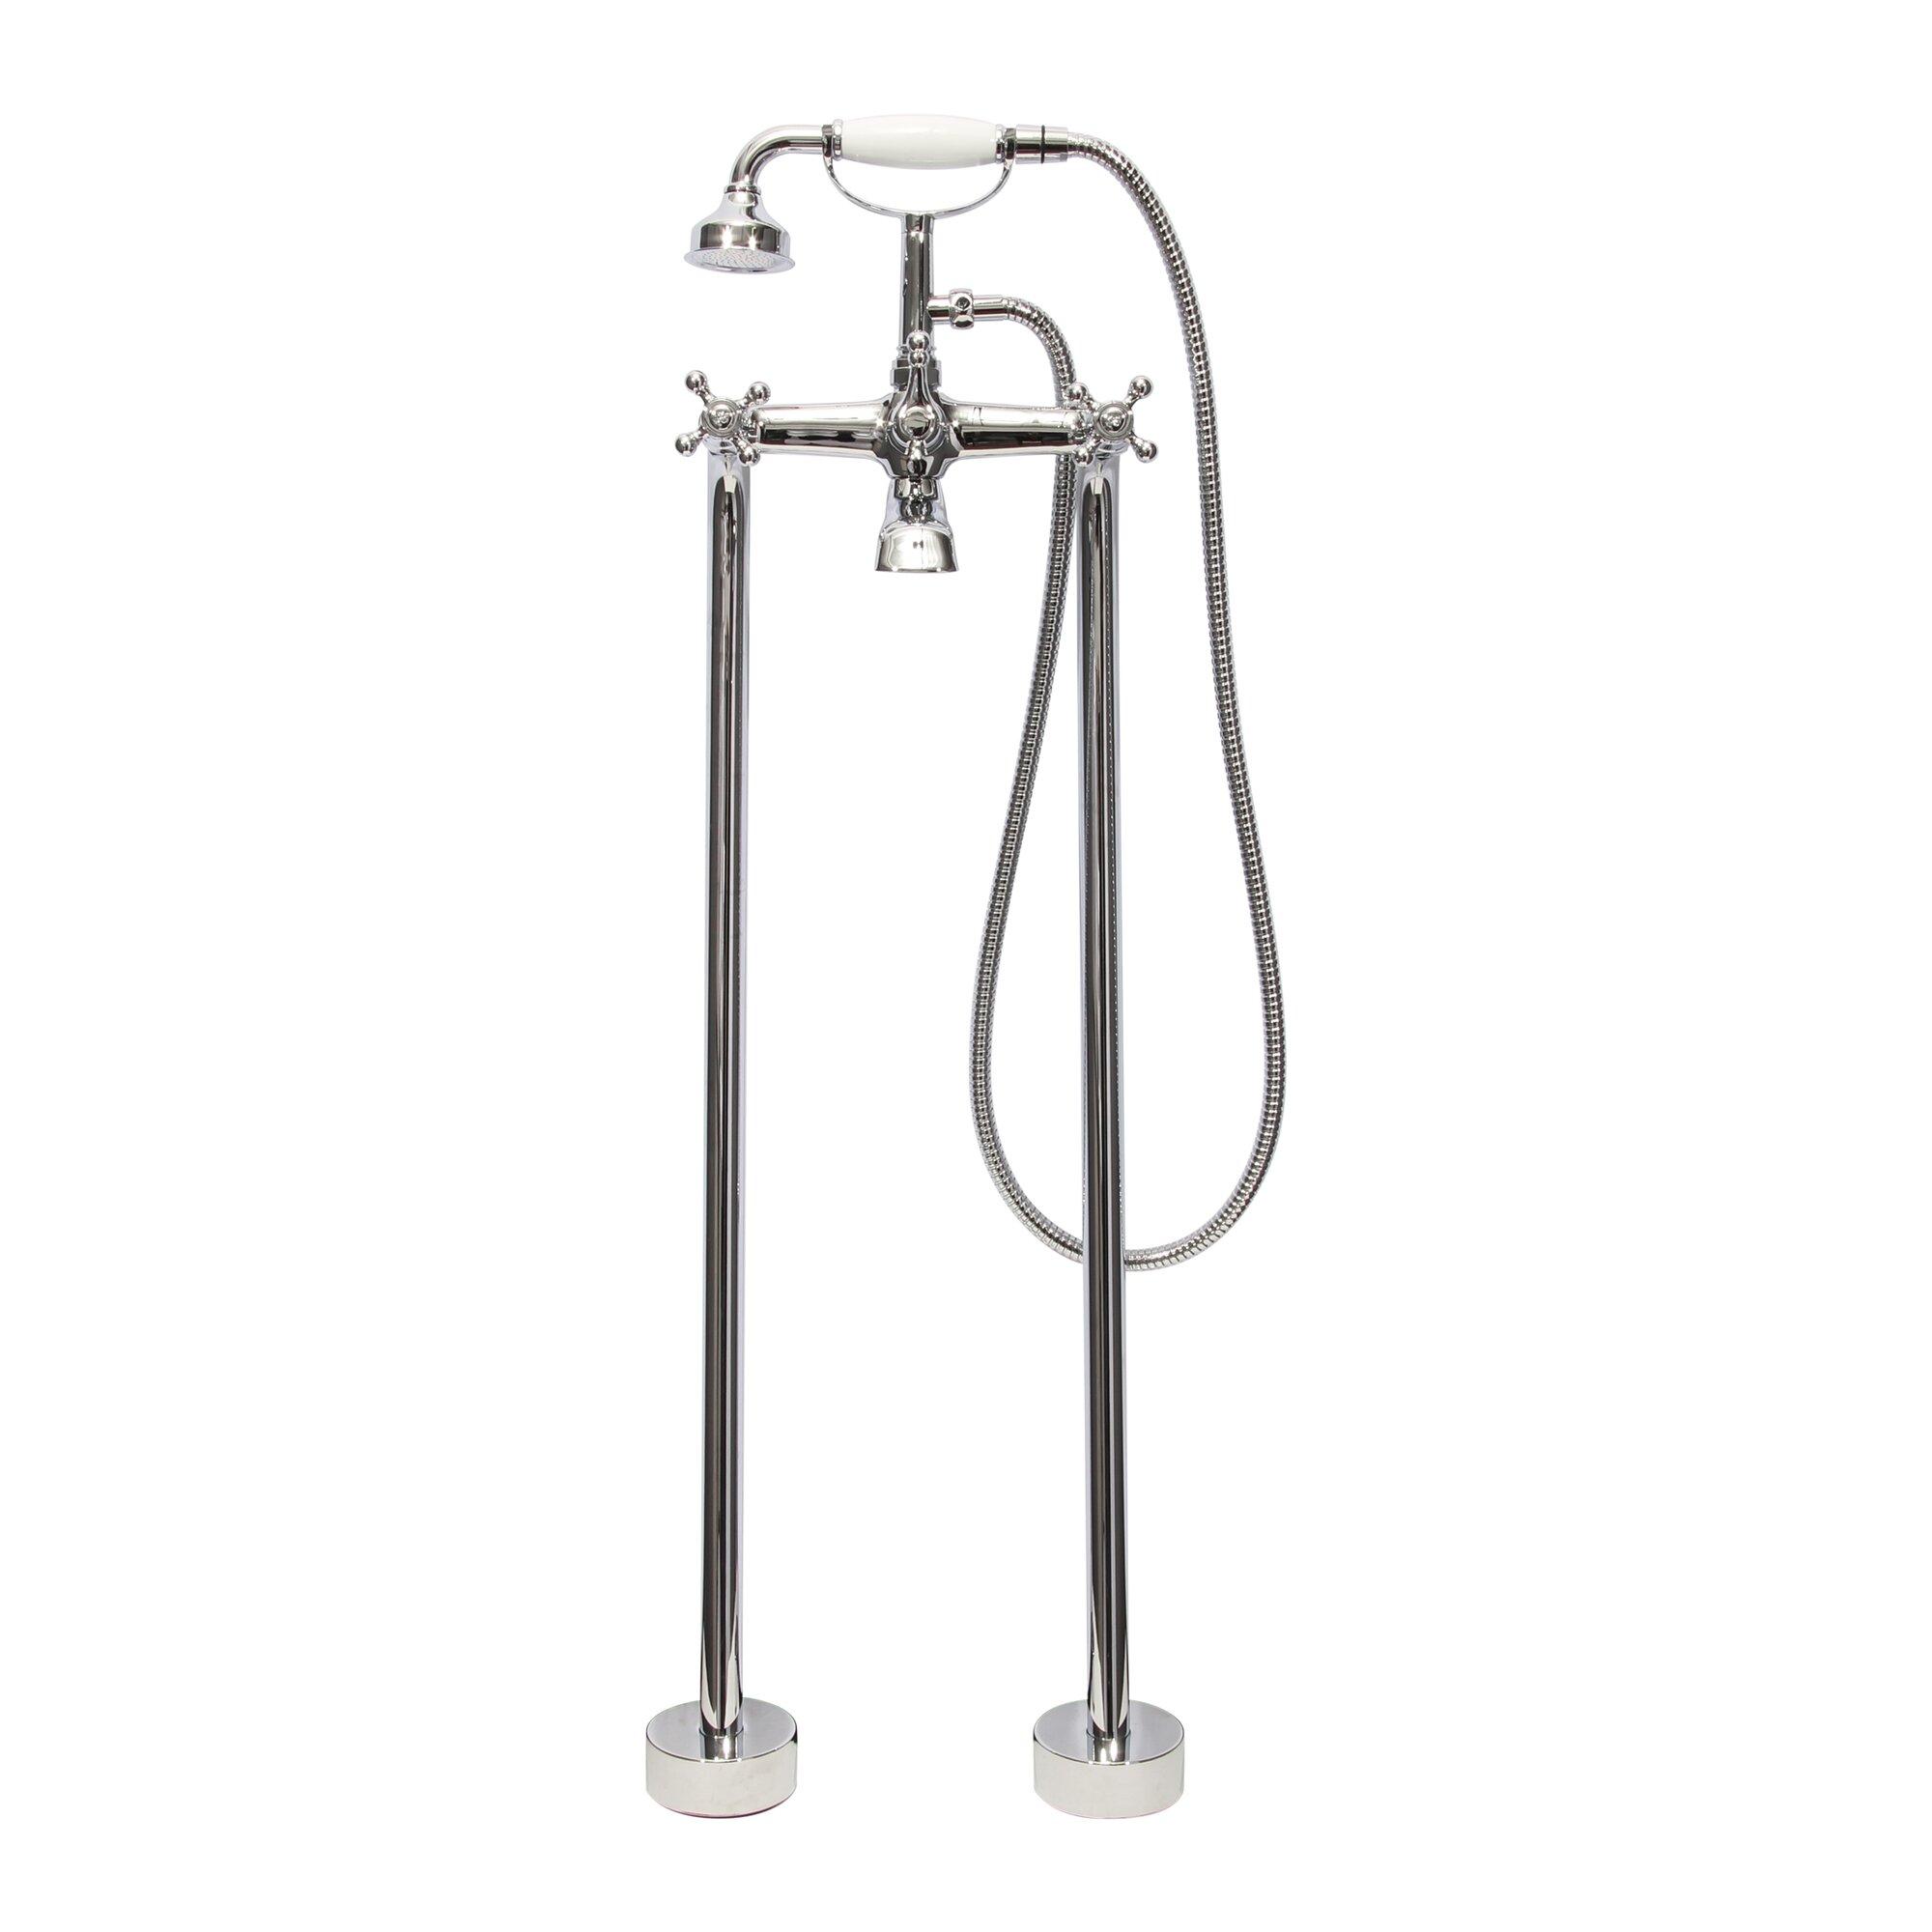 dyconn faucet double handle floor mount tub filler faucet with